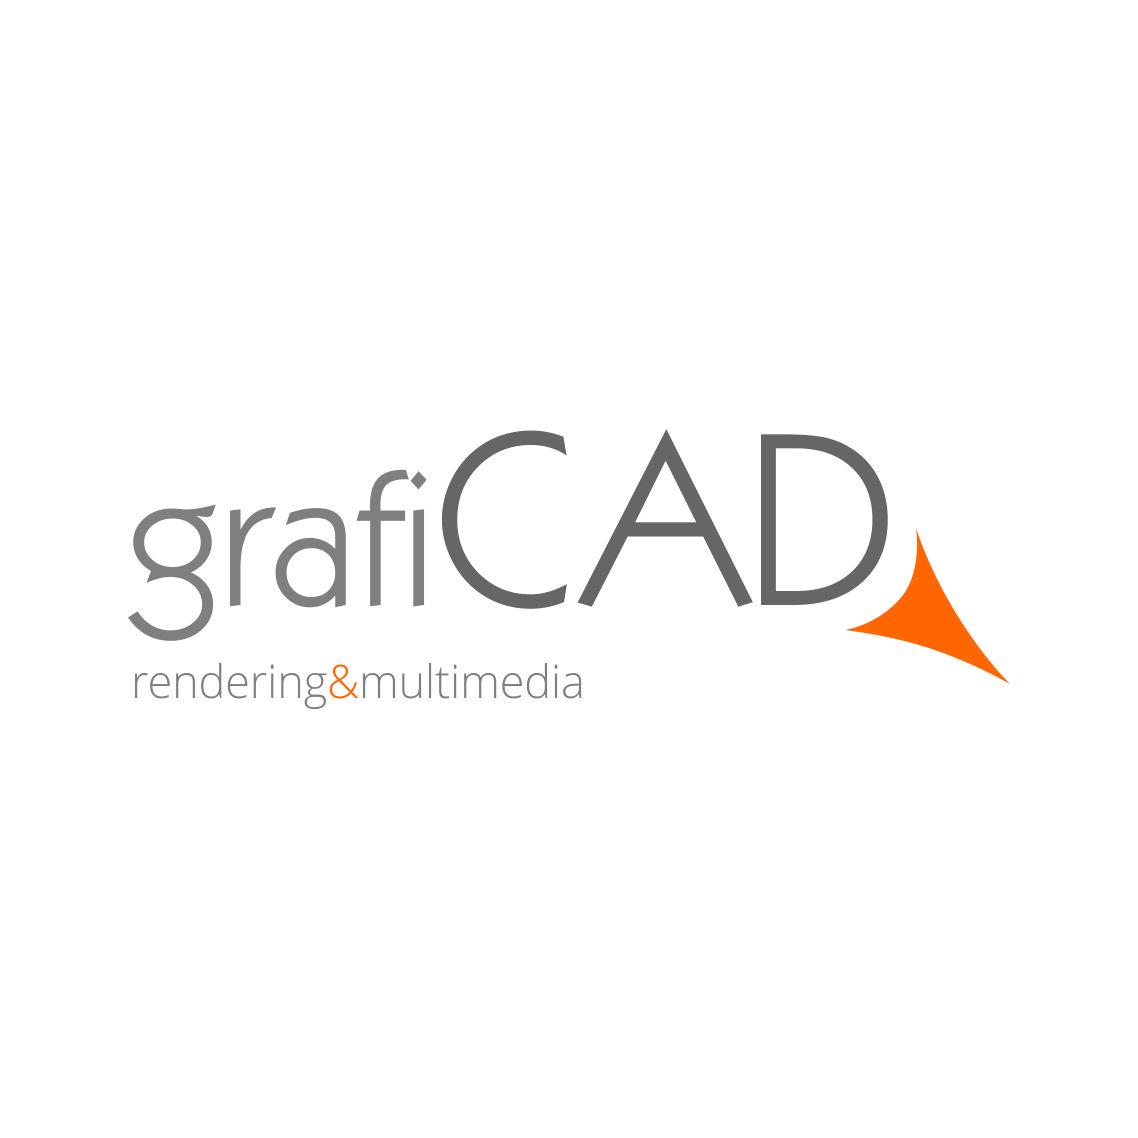 GrafiCAD